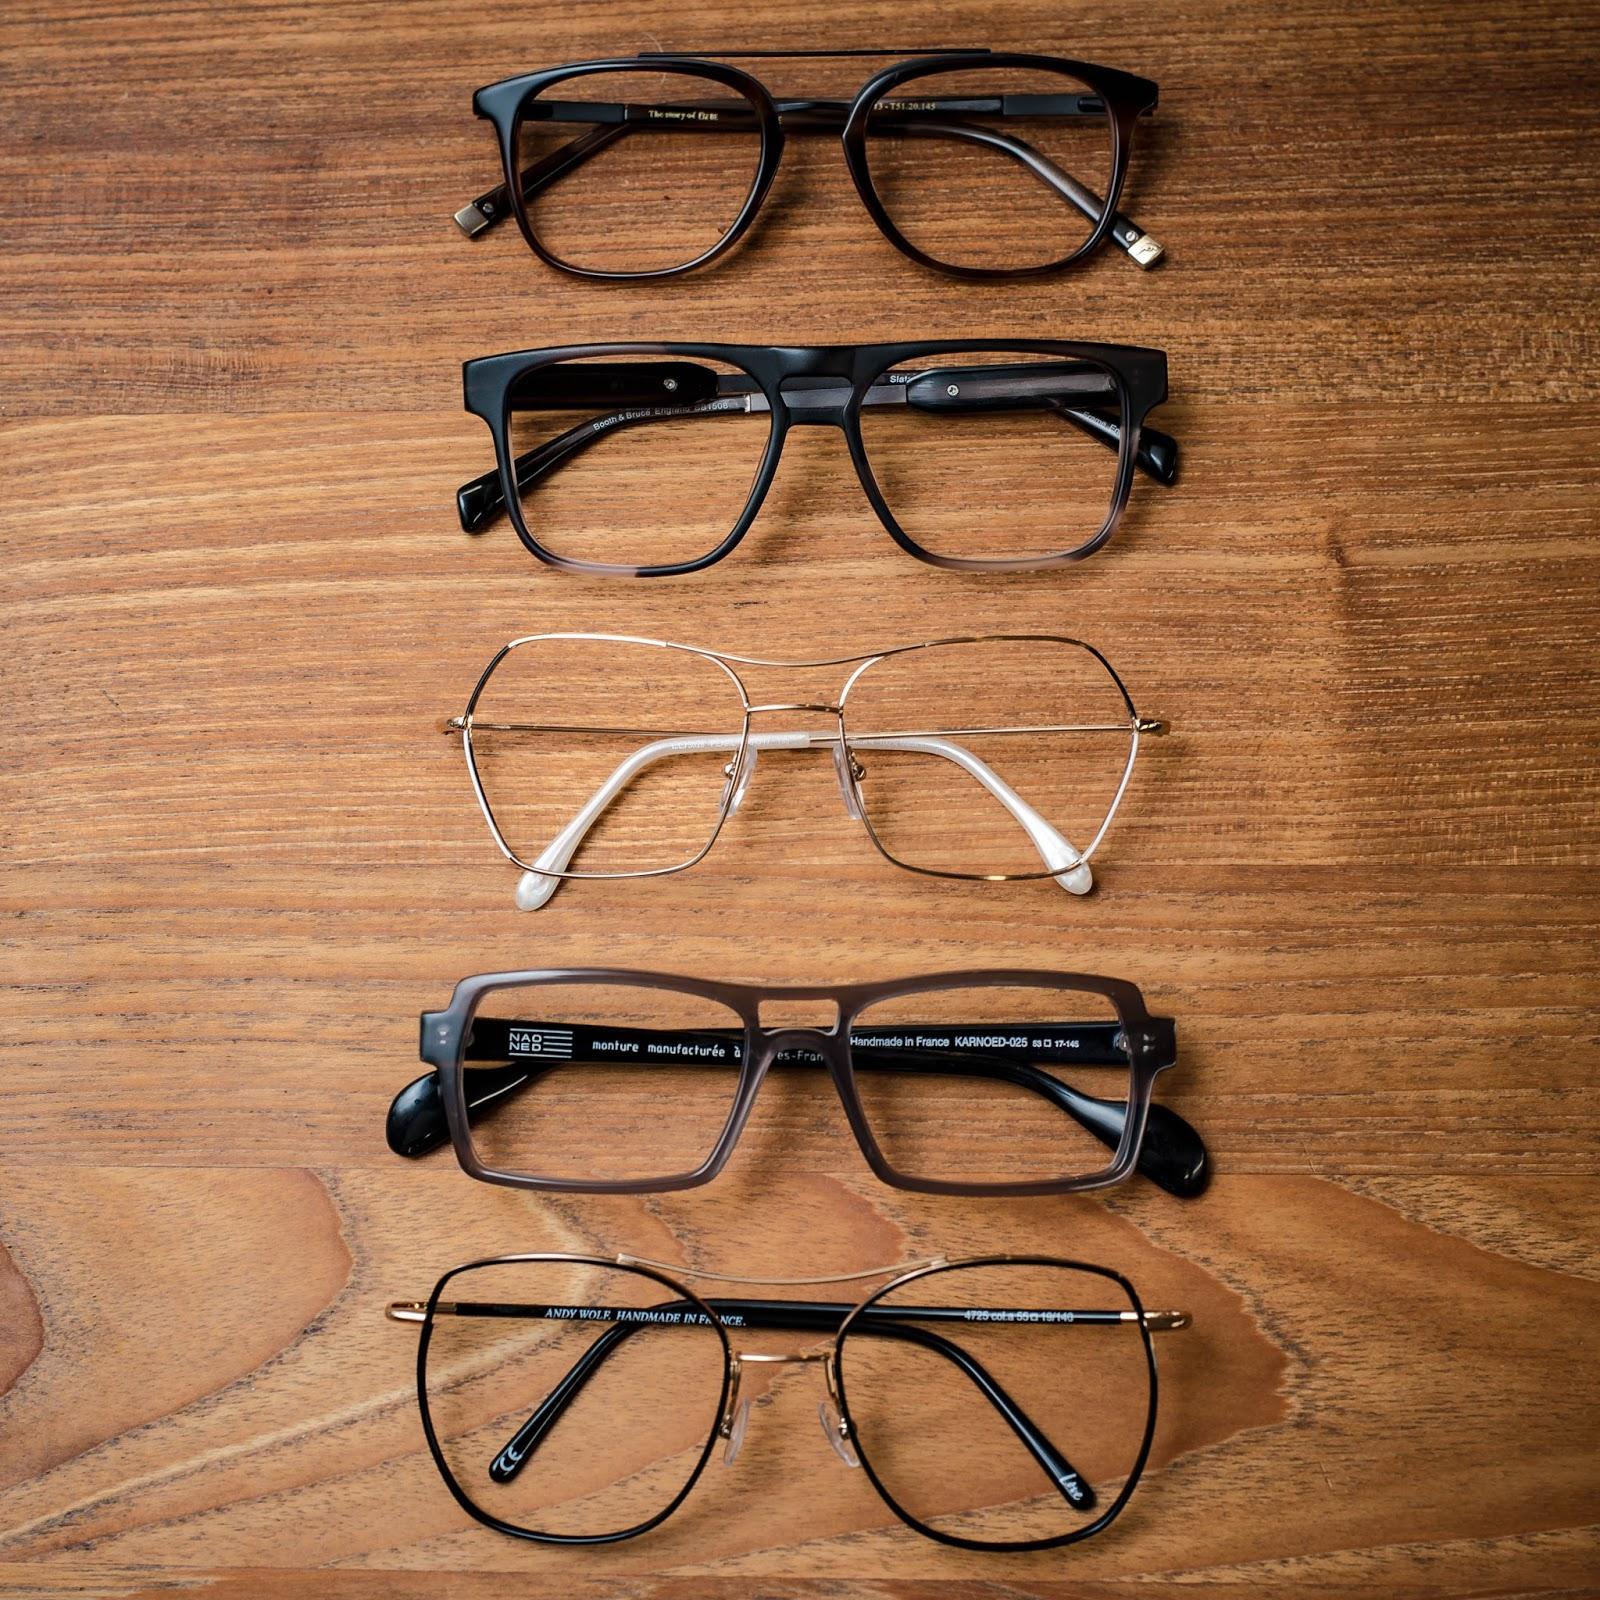 34a51cc5f903 Highbrow society  The double bar design dominates the eyeglass world ...